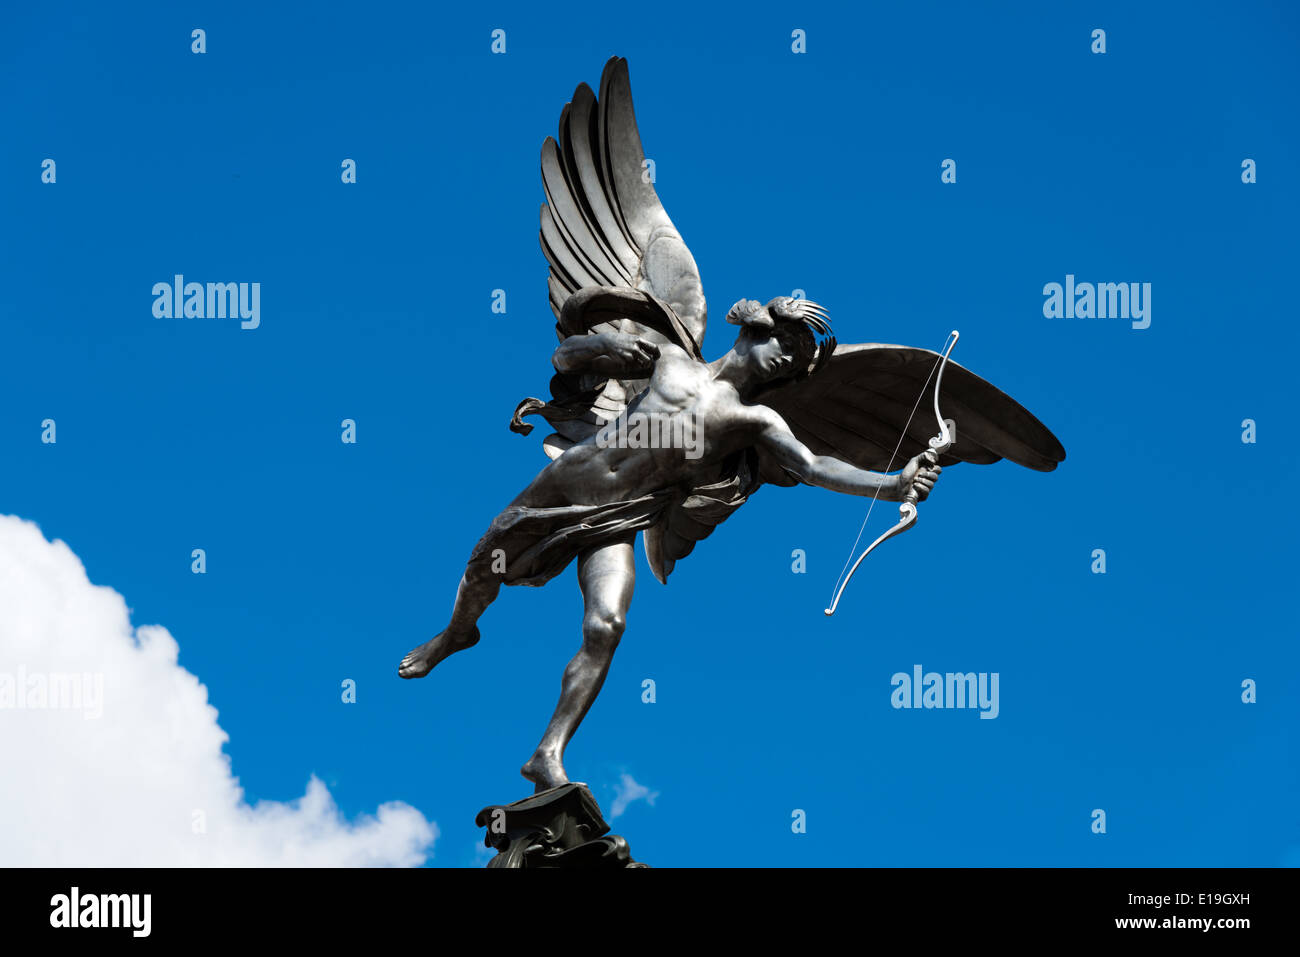 Eros statue, Piccadilly Circus, London, England, UK - Stock Image